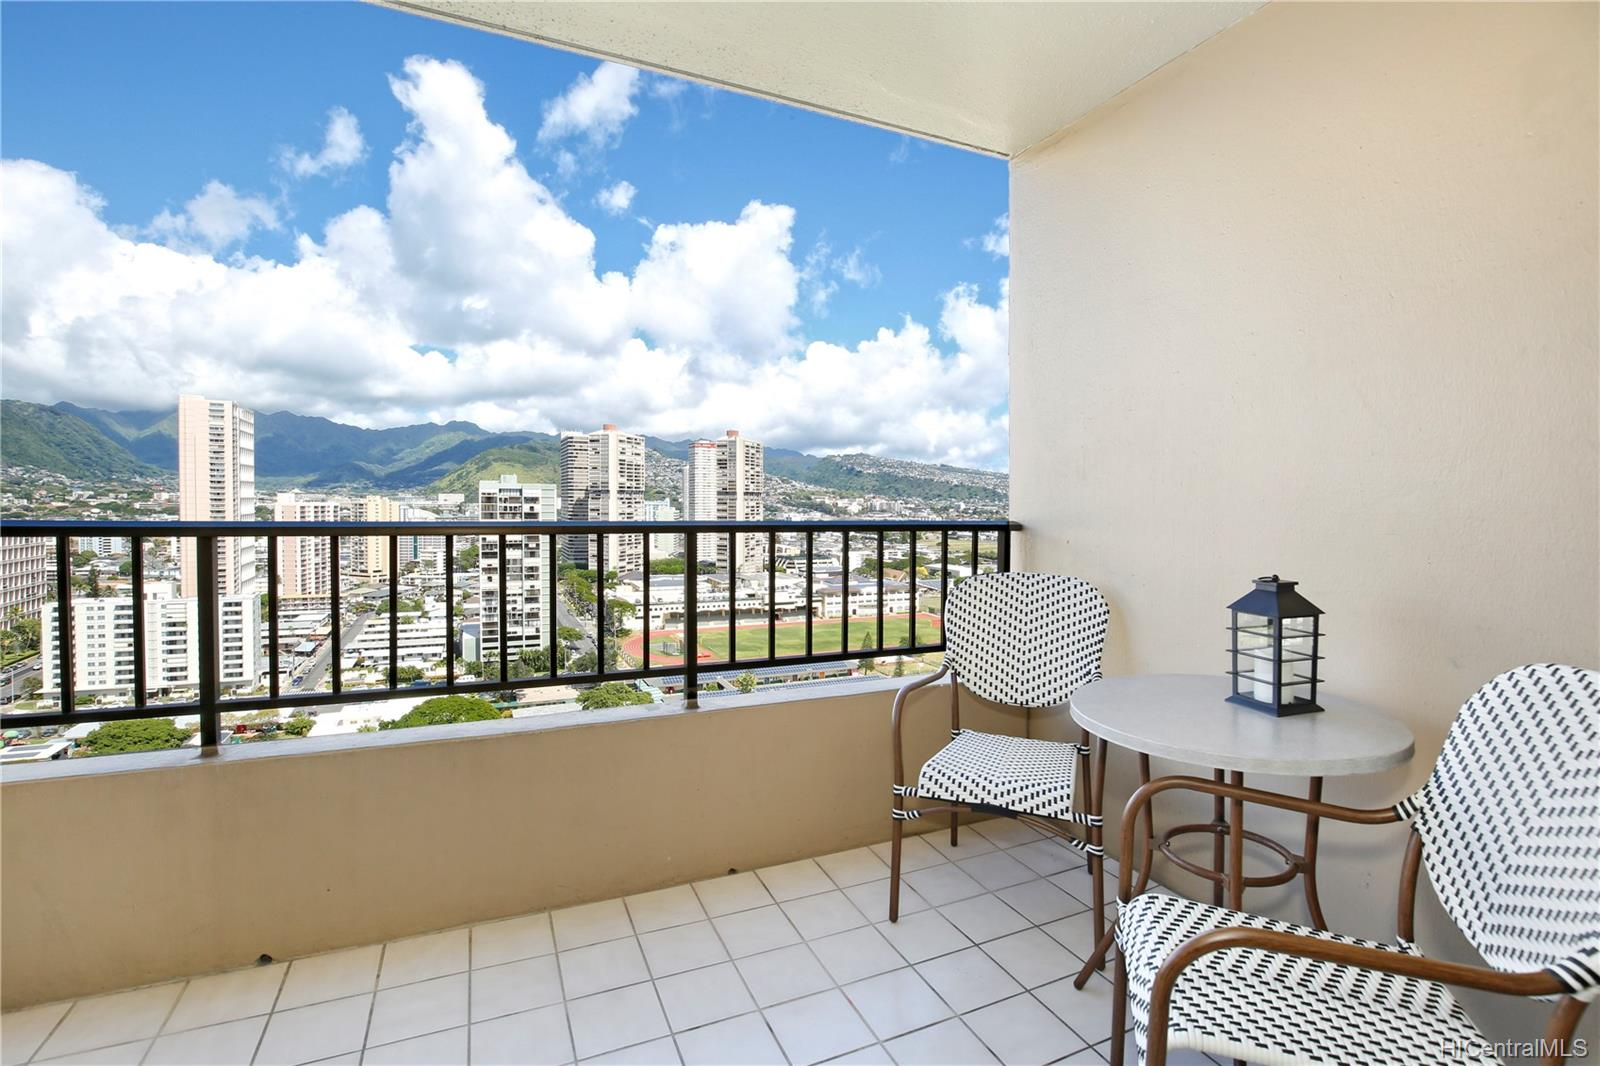 2121 Ala Wai Blvd Honolulu - Rental - photo 7 of 16